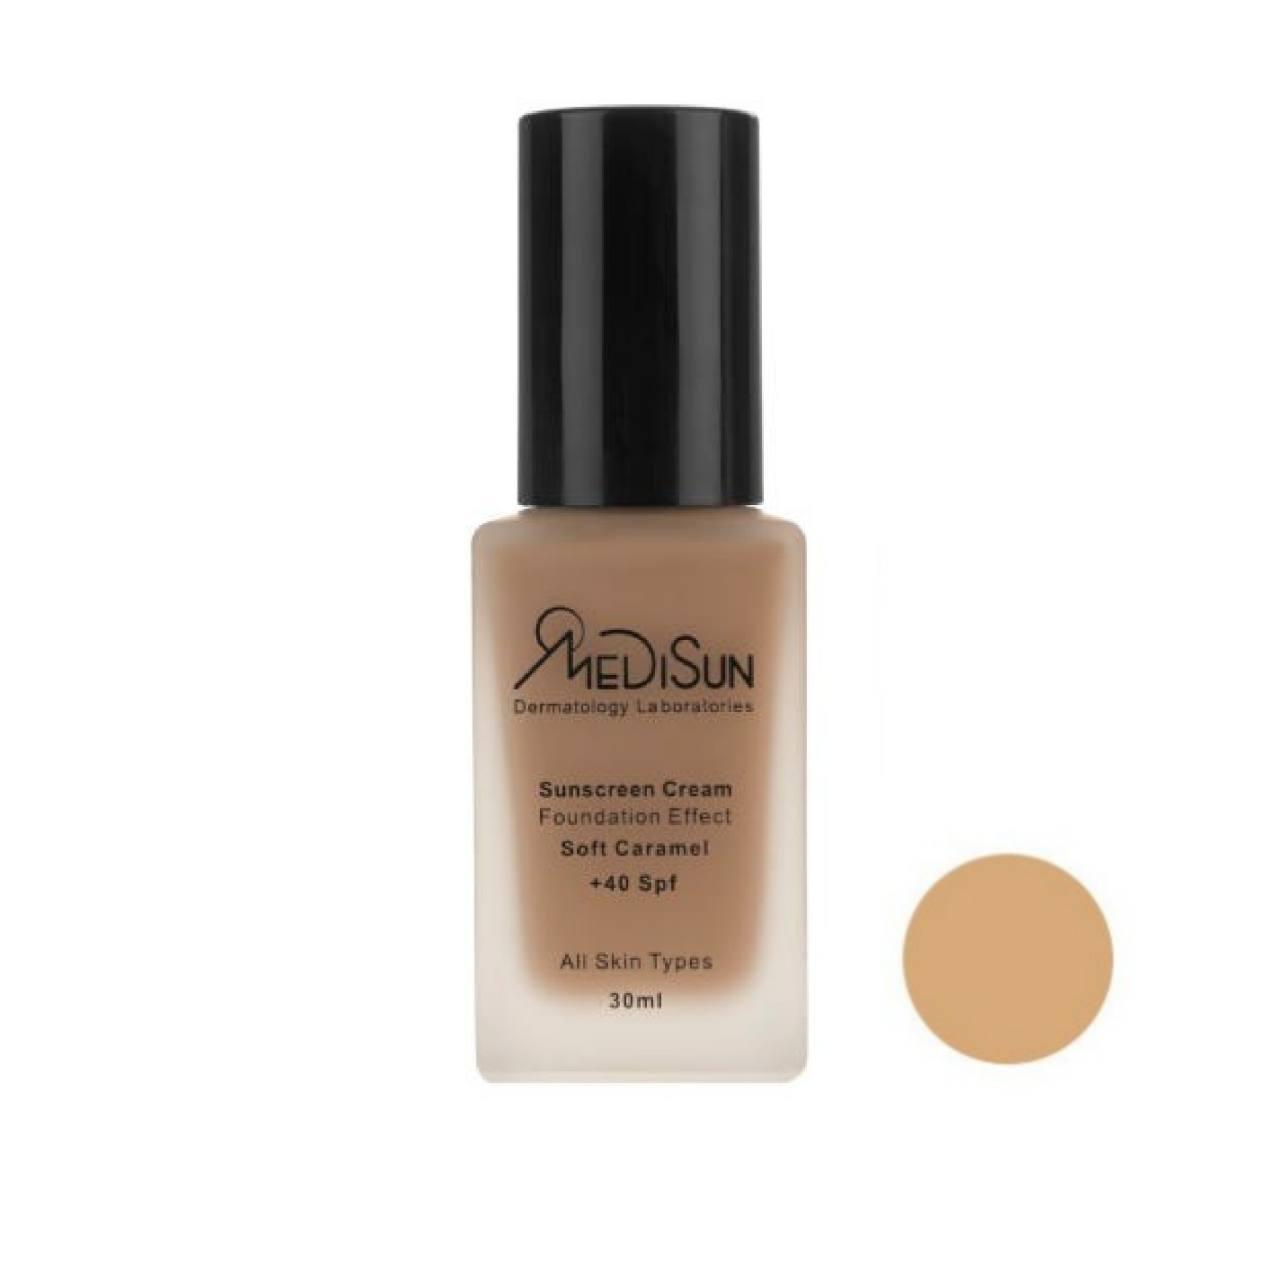 کرم پودر مدیسان سری All Skin مدل Foundation Effect No 3 حجم 30 میلی گرم